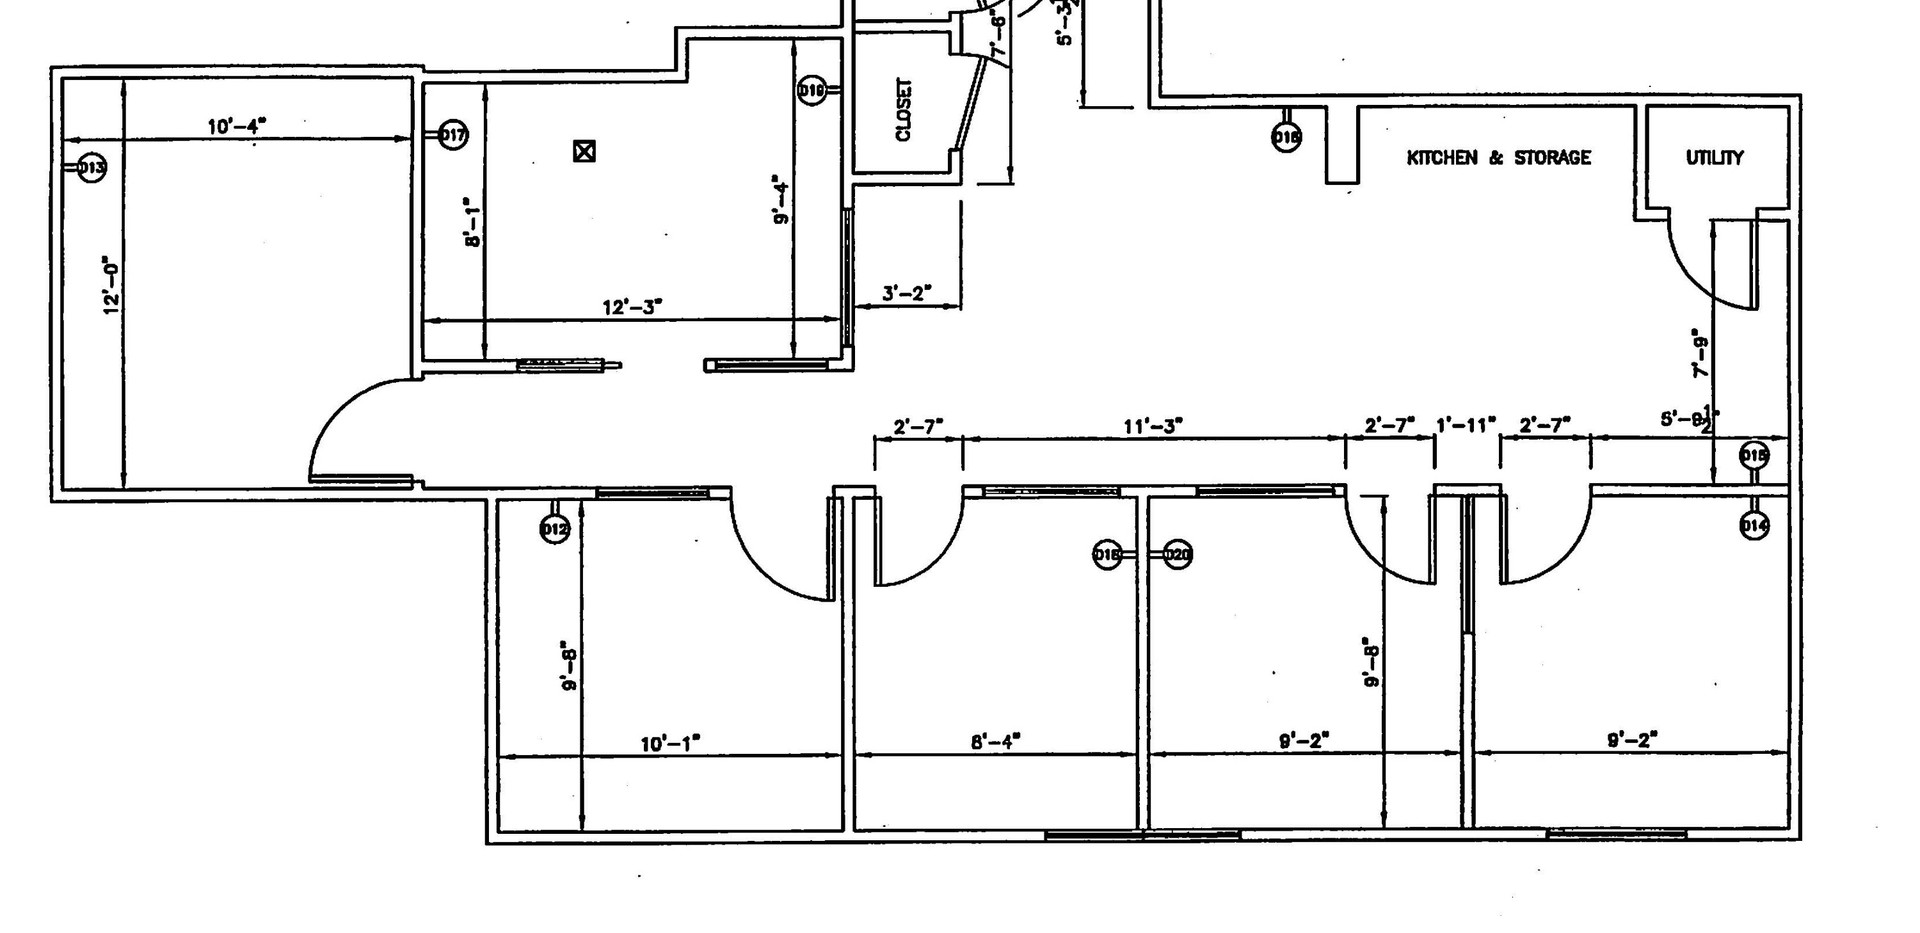 162 Danbury Road - First Floor Suite Plan